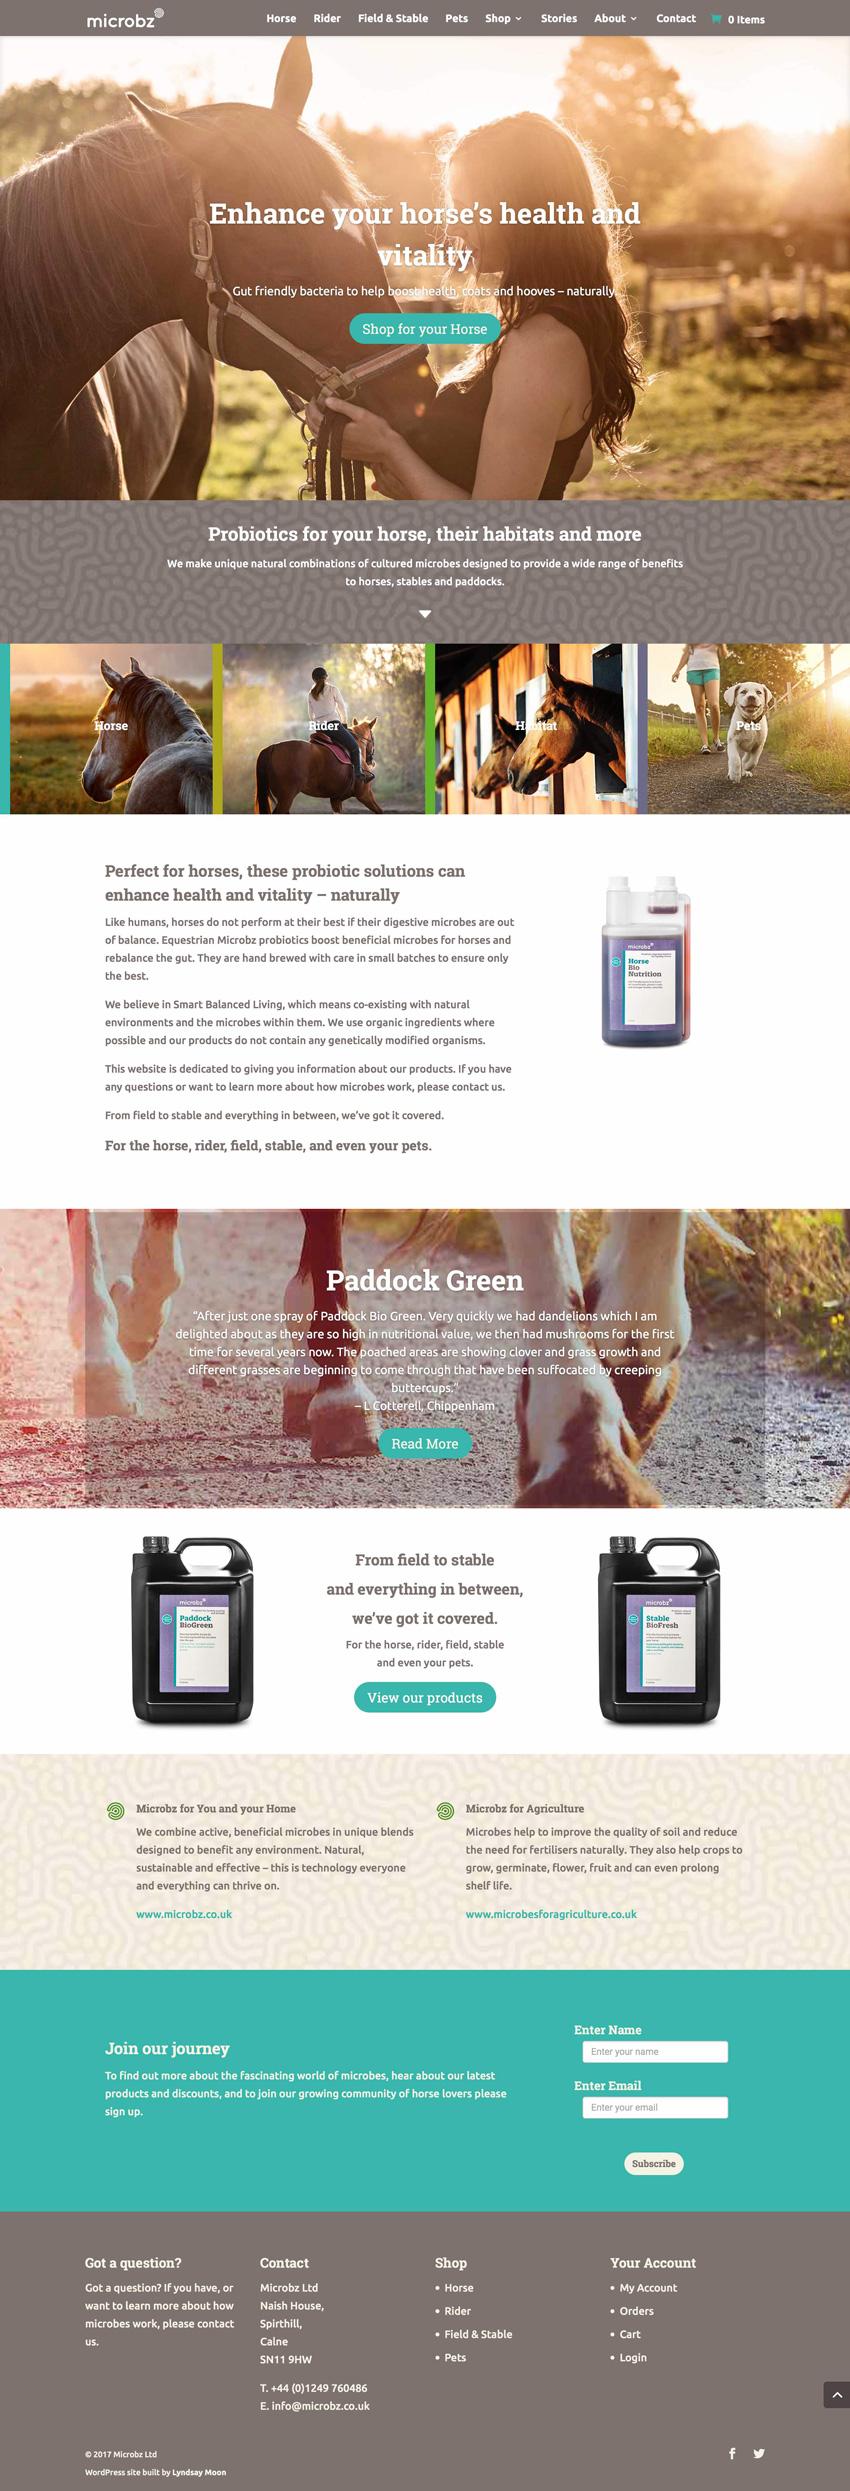 Equestrian Microbz Website Design screenshot